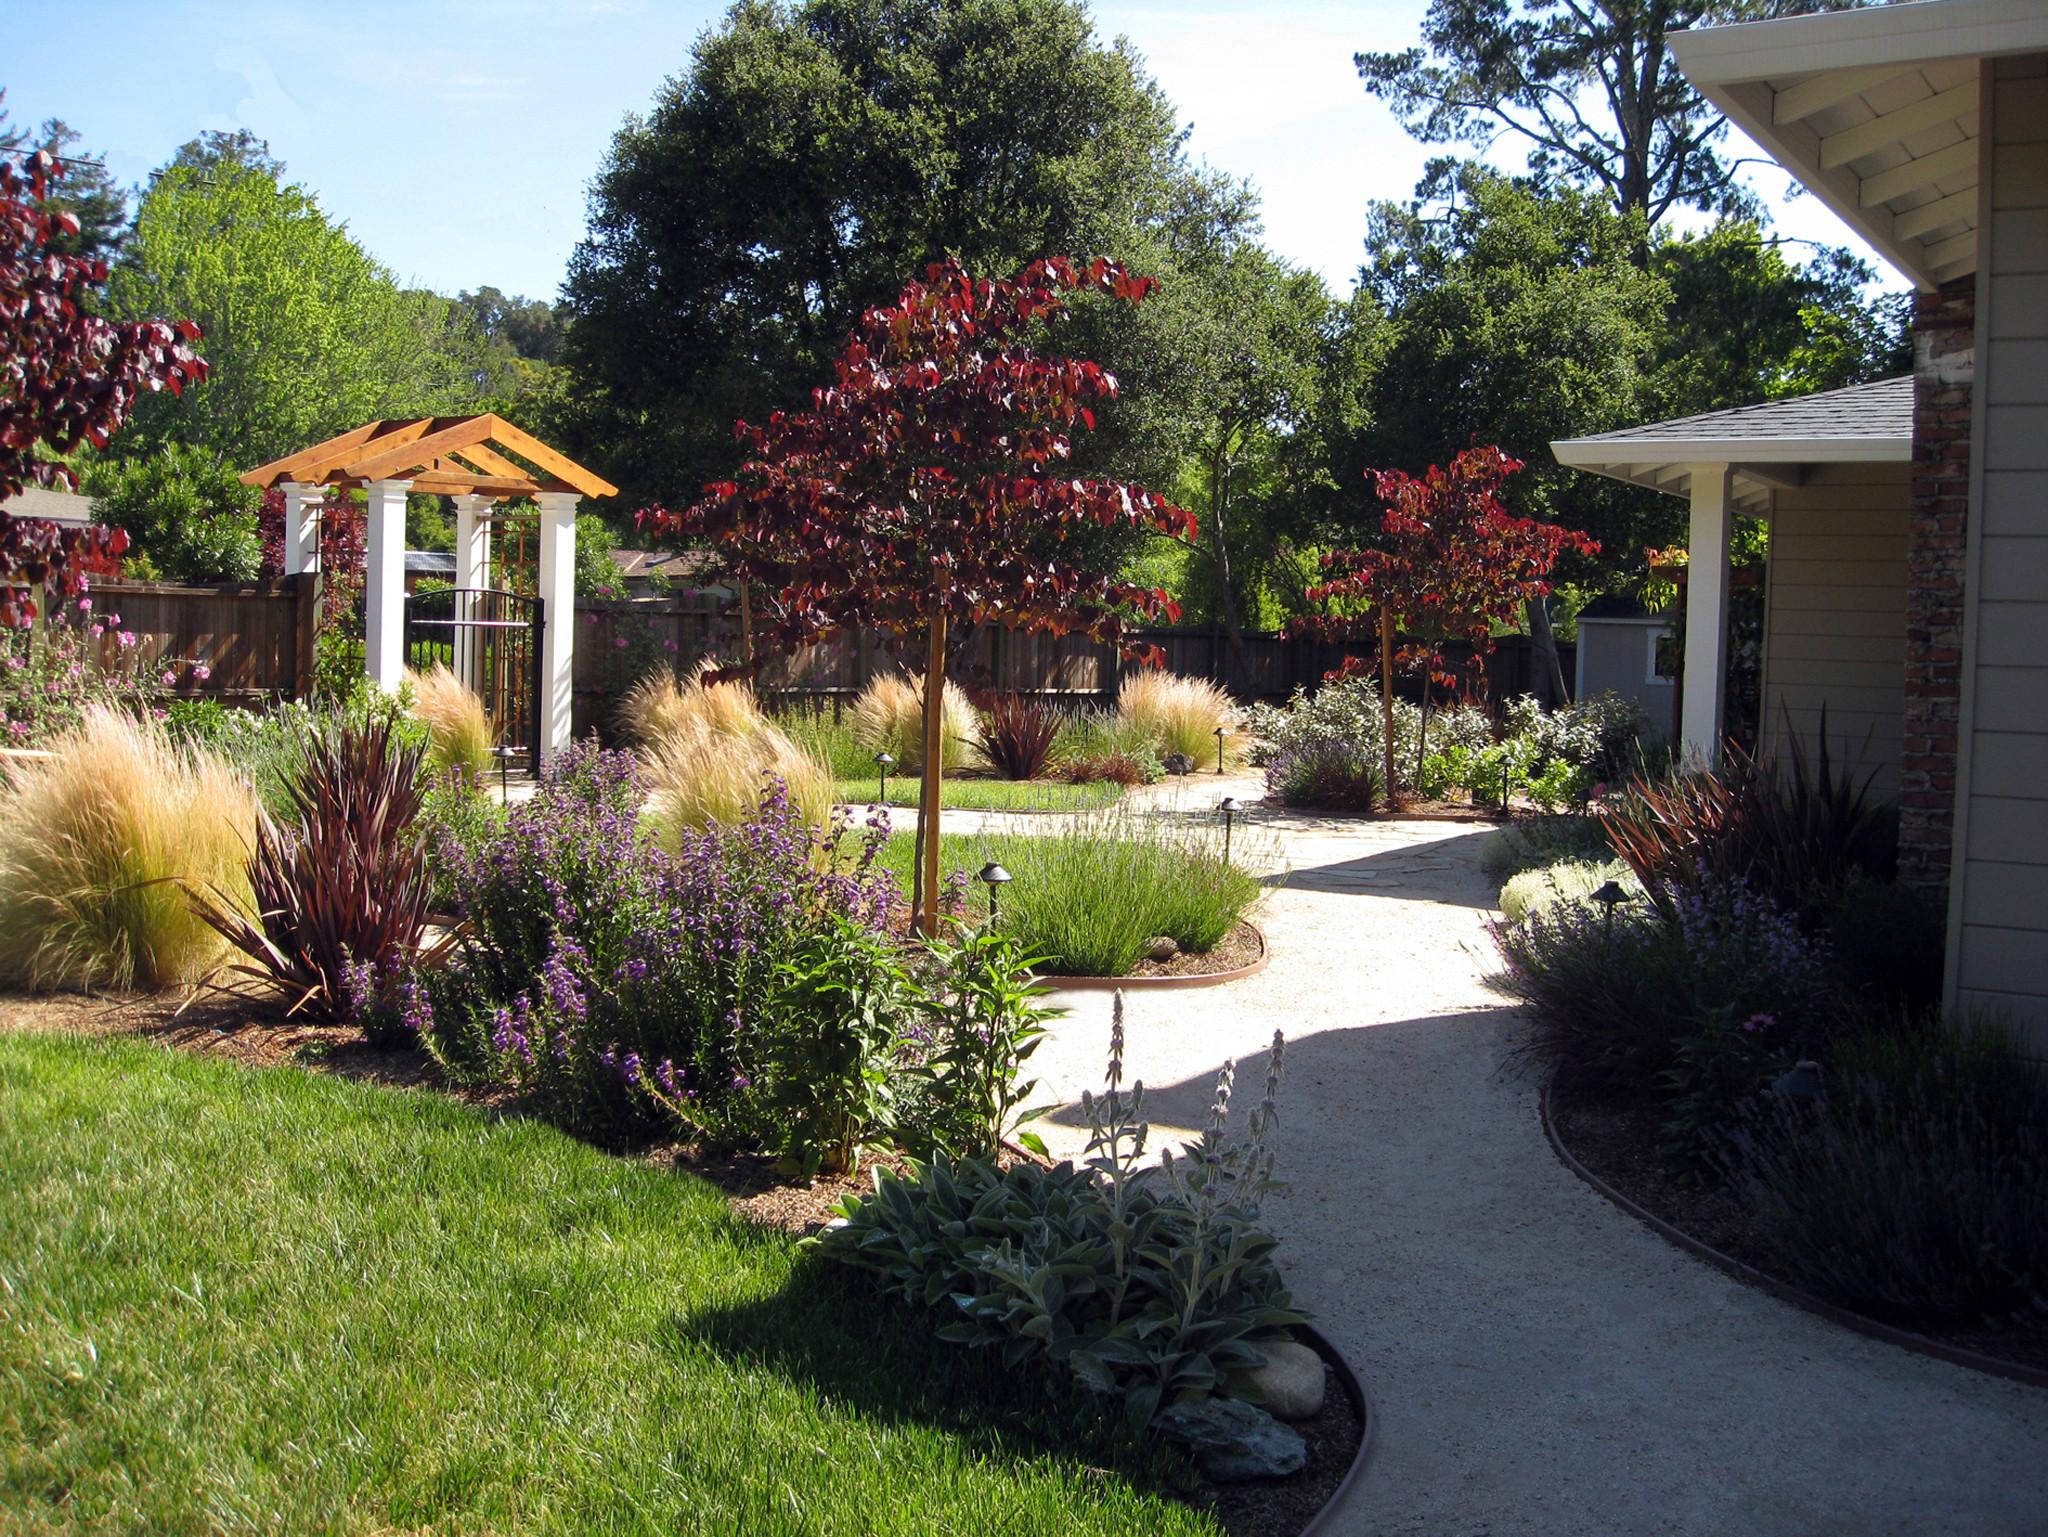 Landscape Design For Front Yards  Some Ideas of Front Yard Landscaping for a Small Front